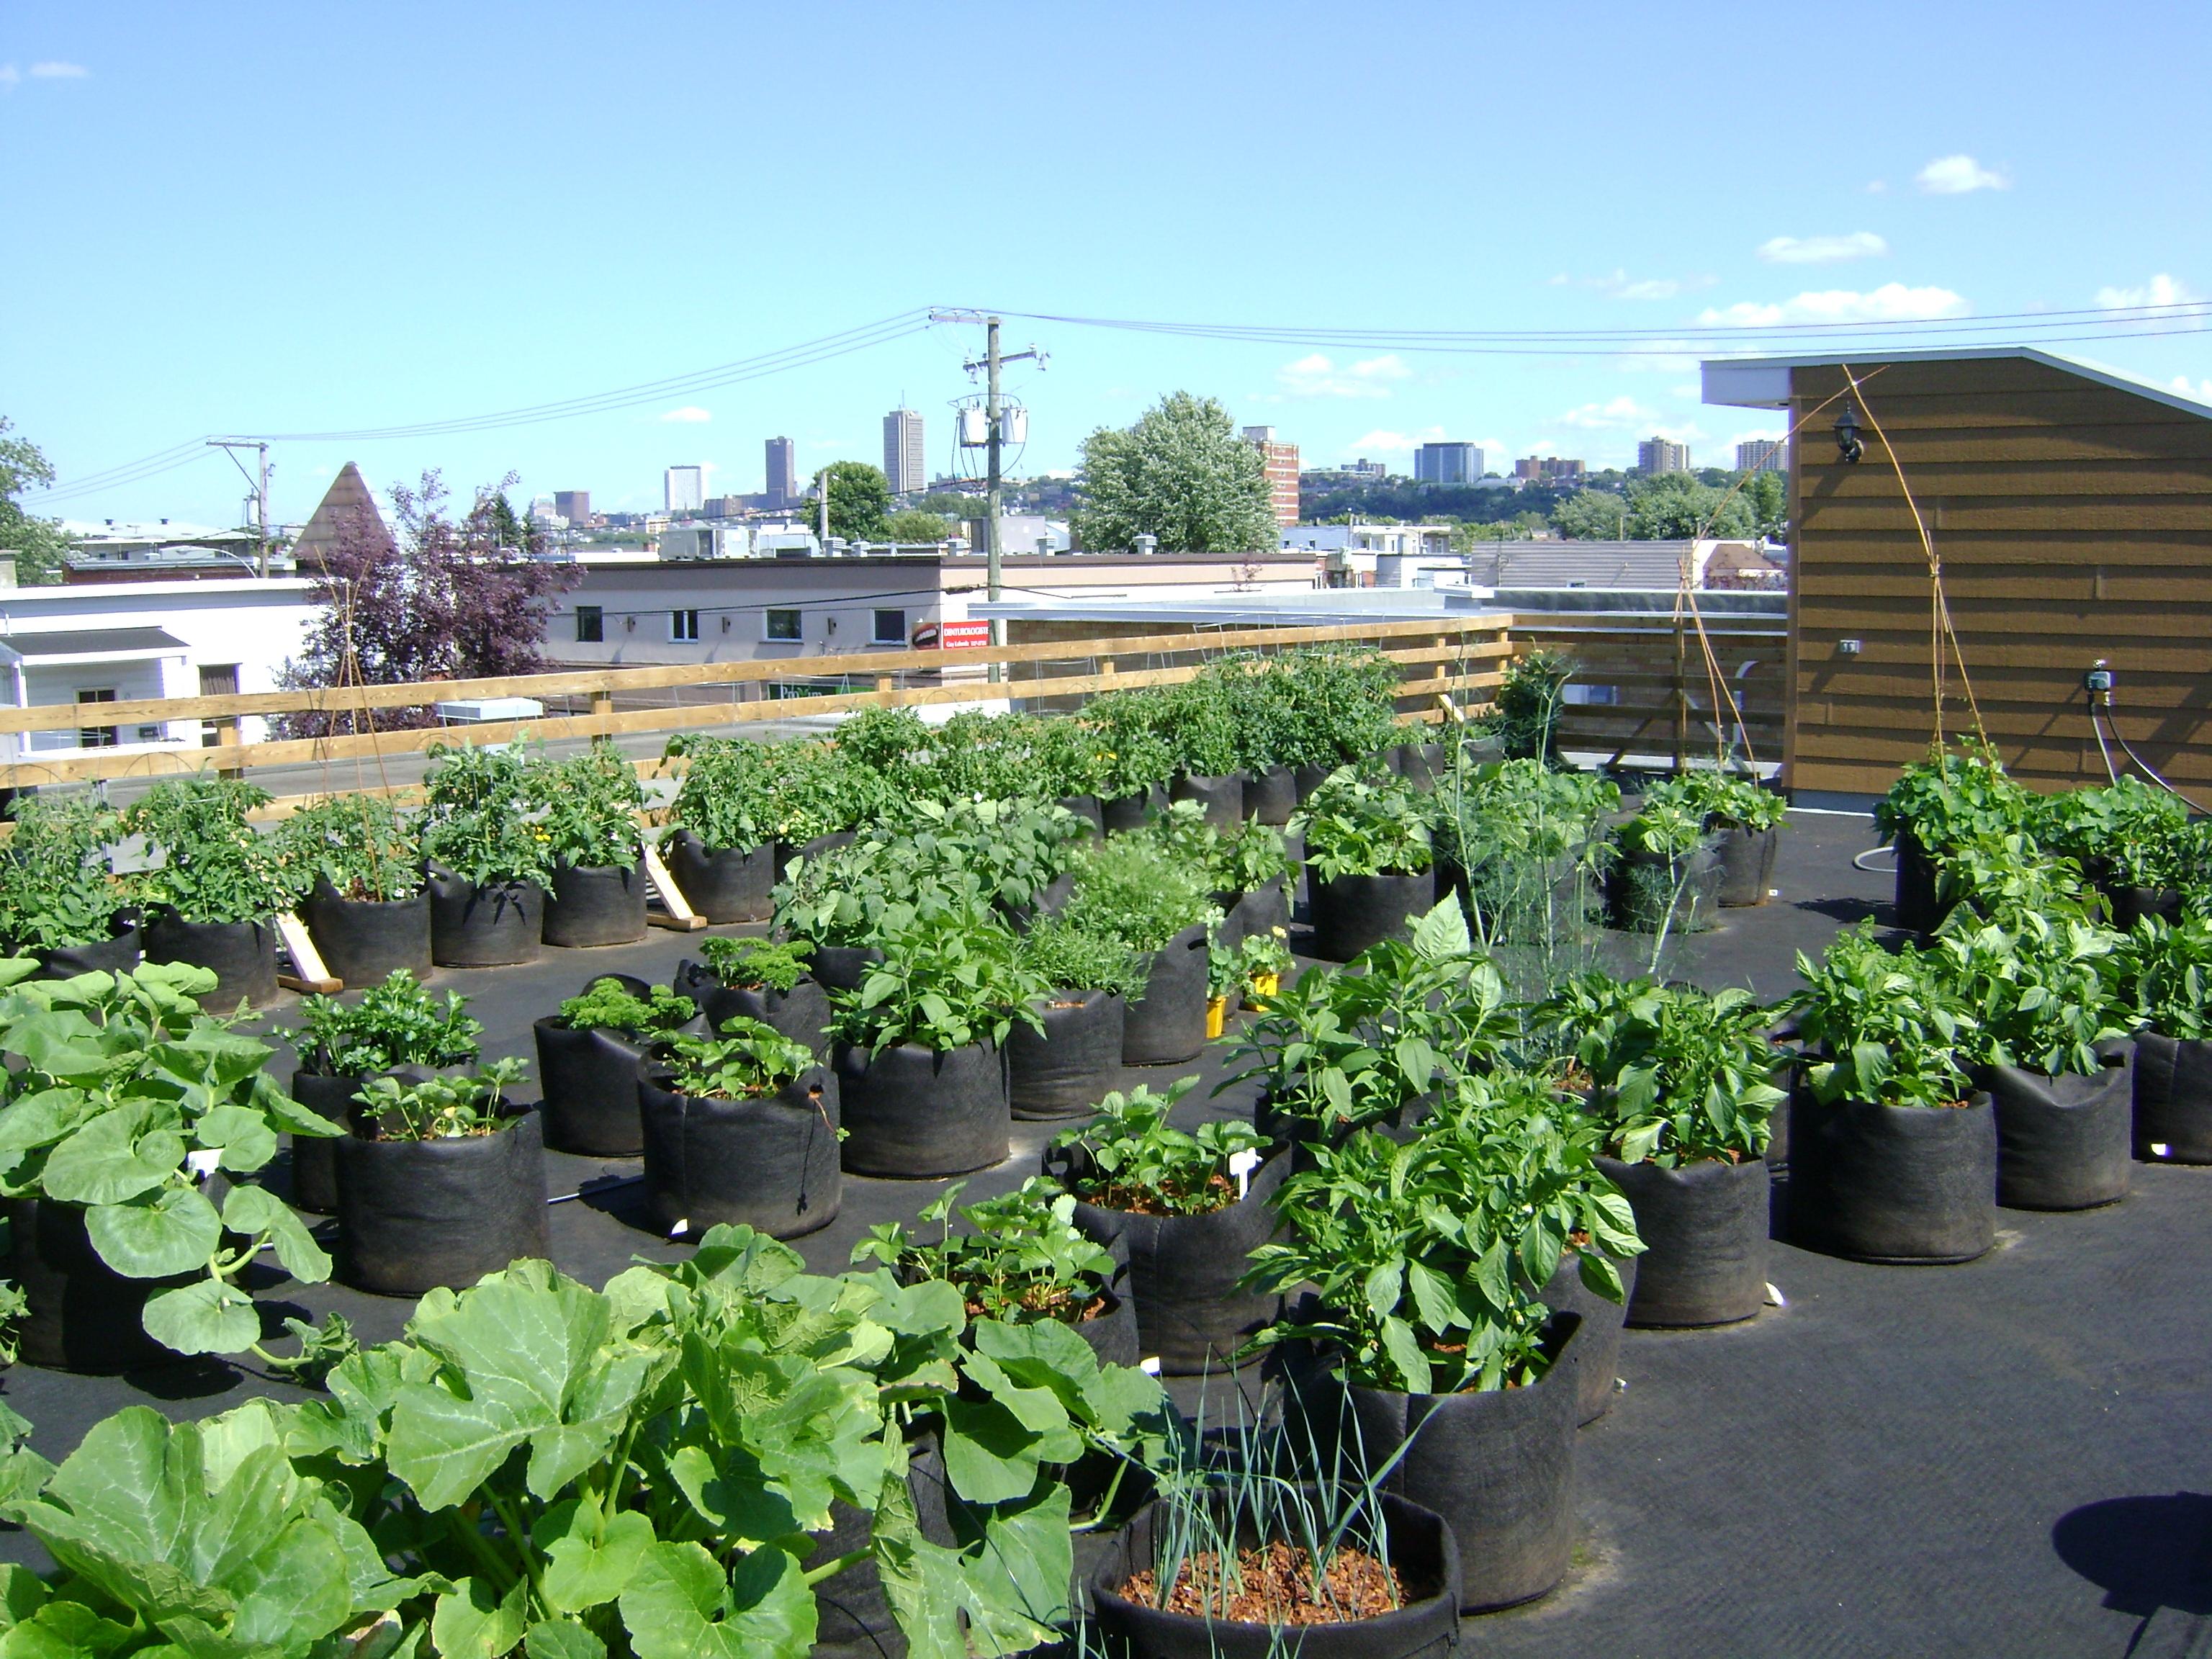 Toit jardin et vue de Québec